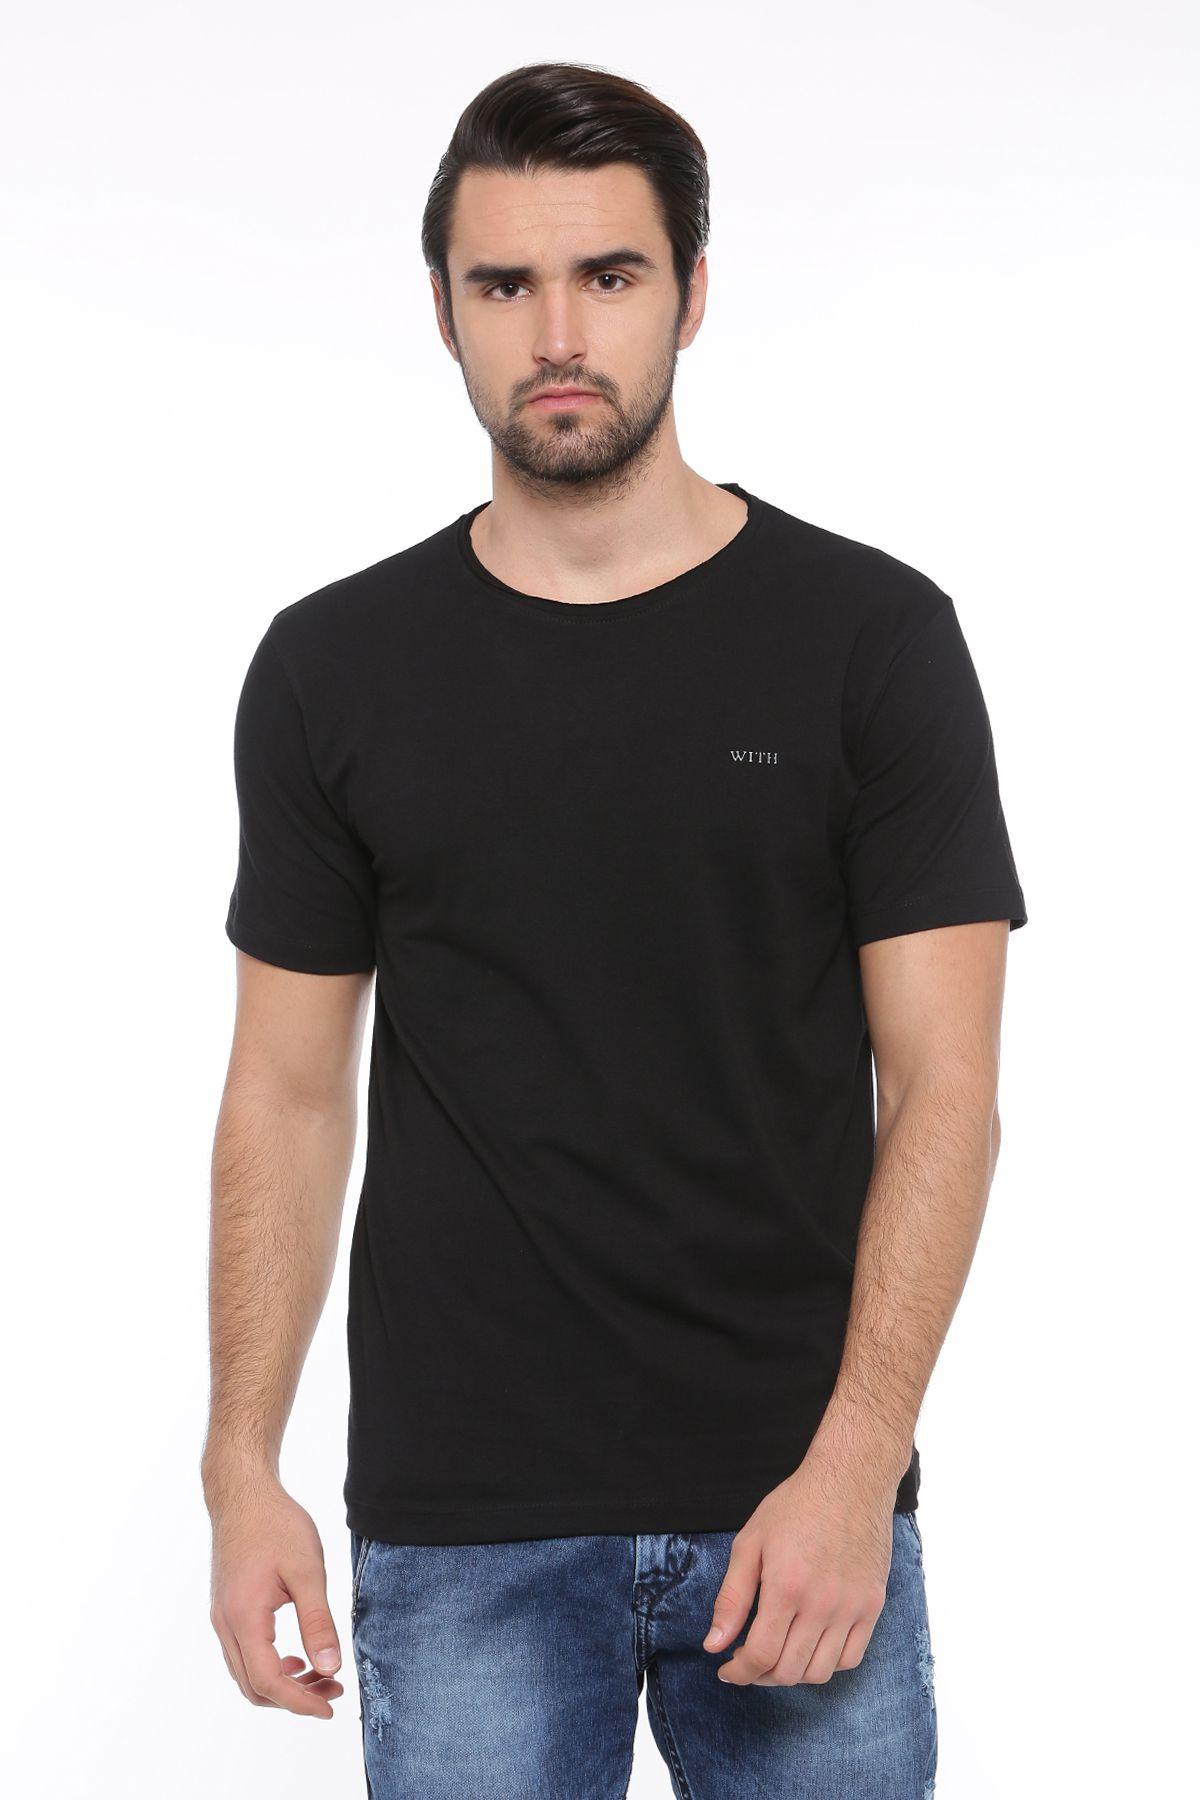 SHOWOFF Black Round T-Shirt